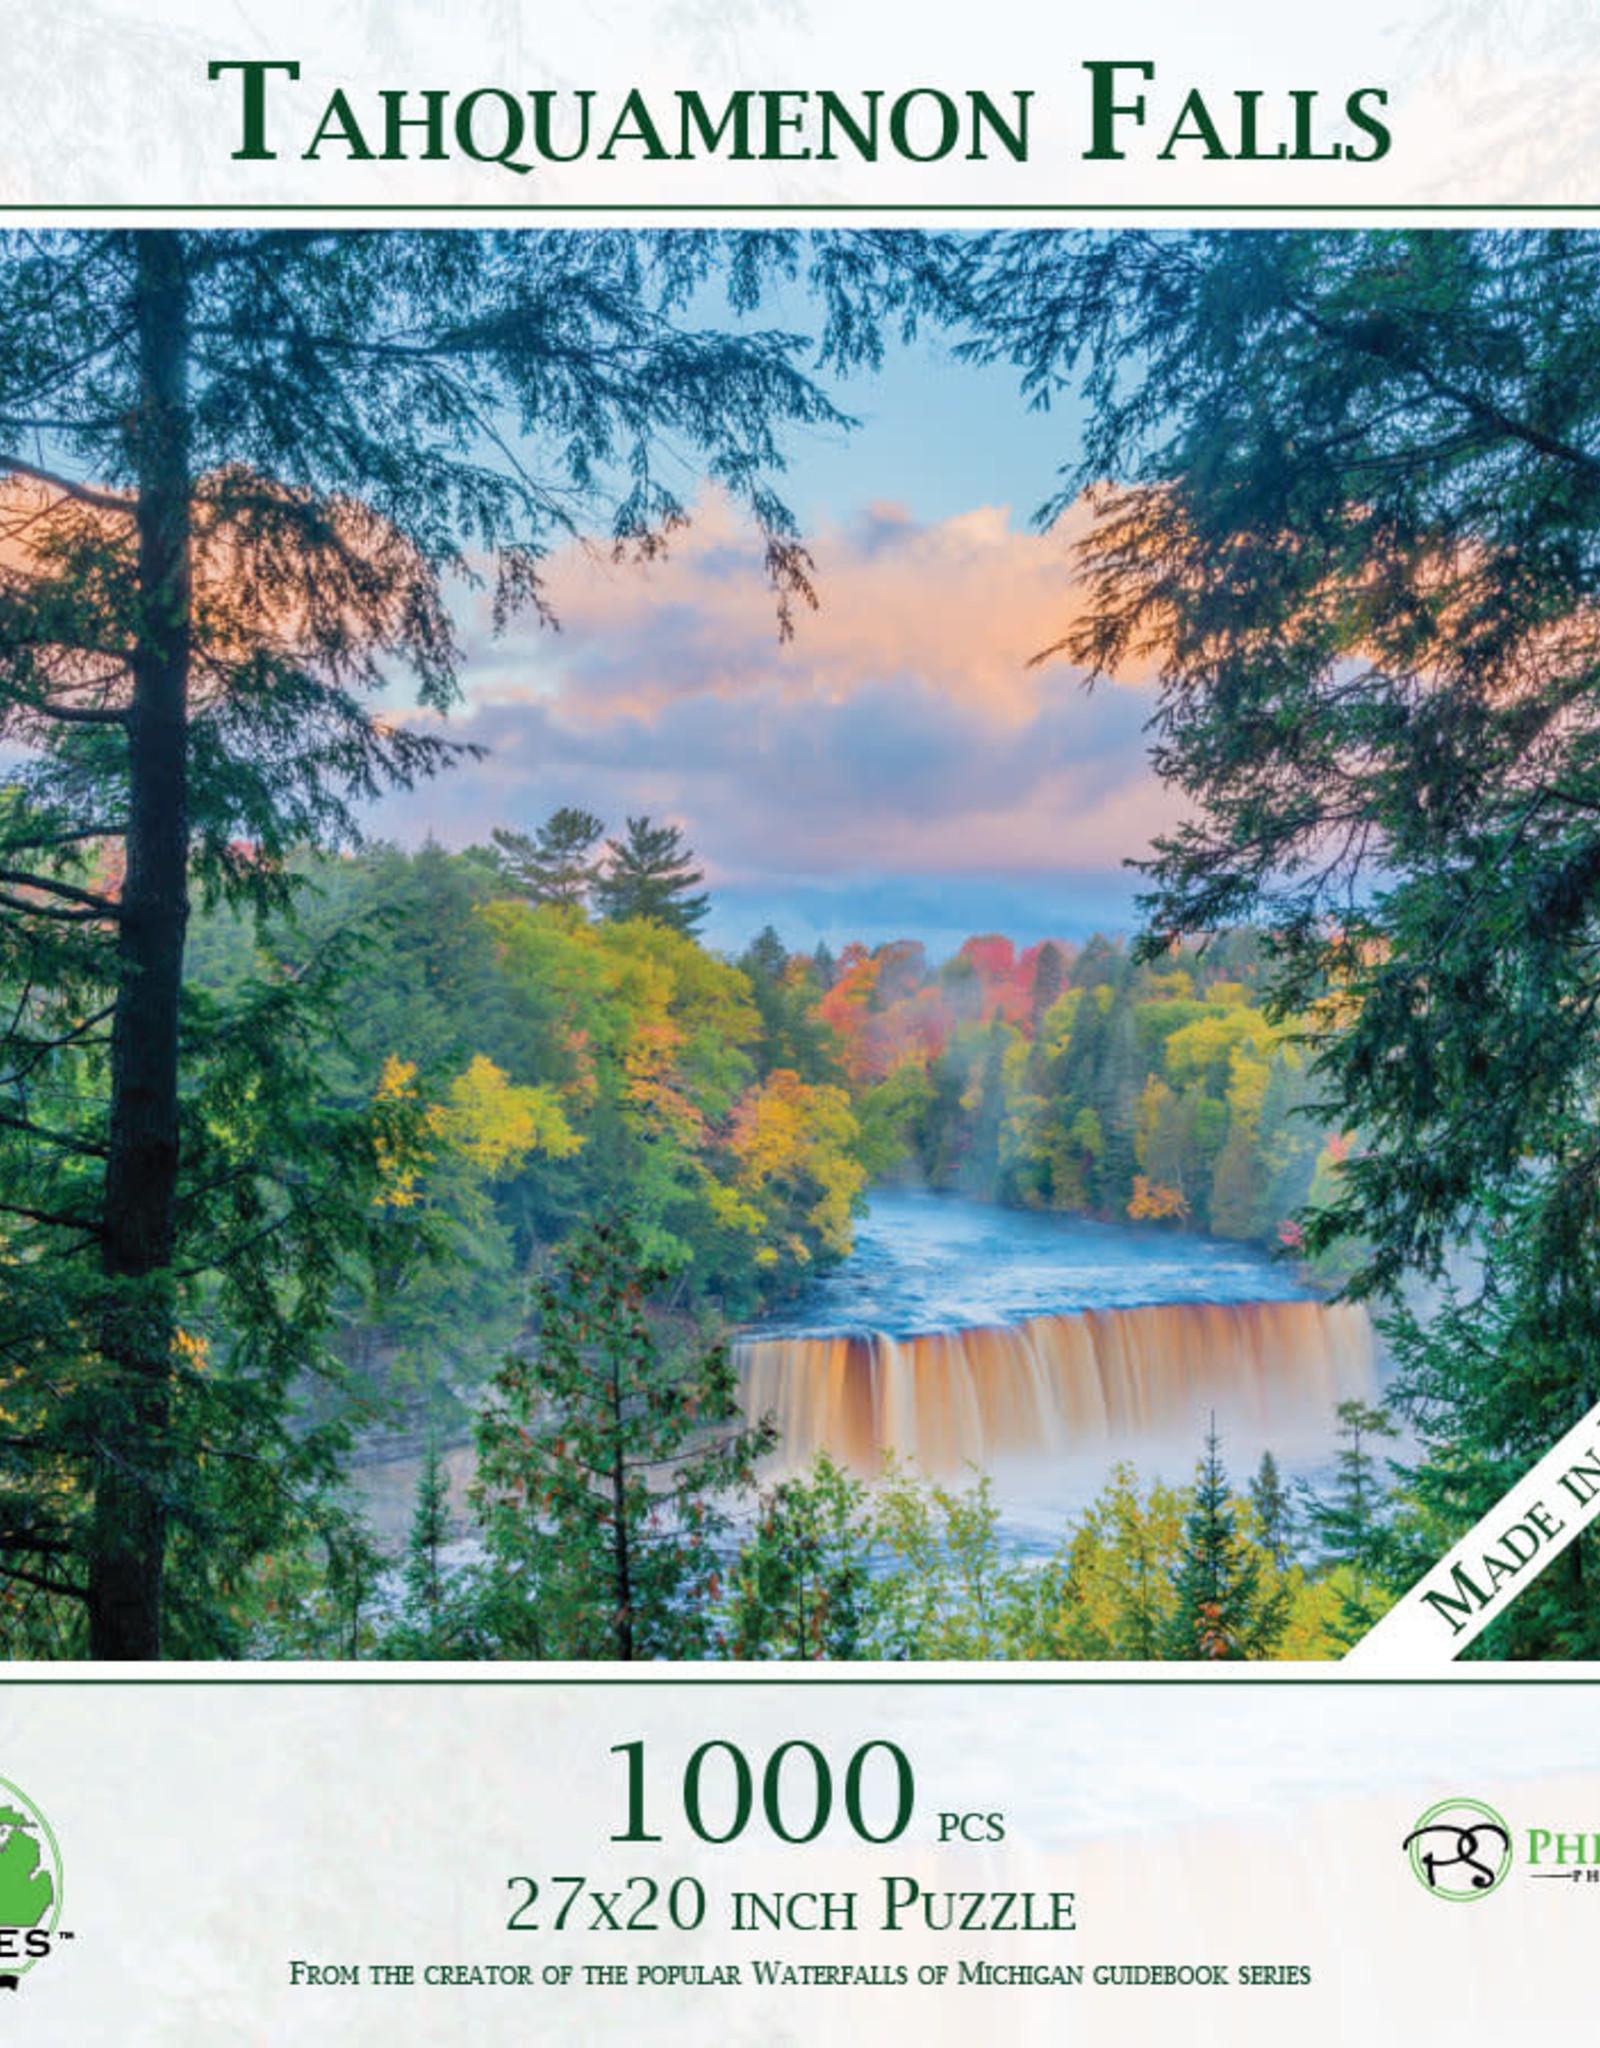 MI Puzzles 1000pc Tahquamenon Falls